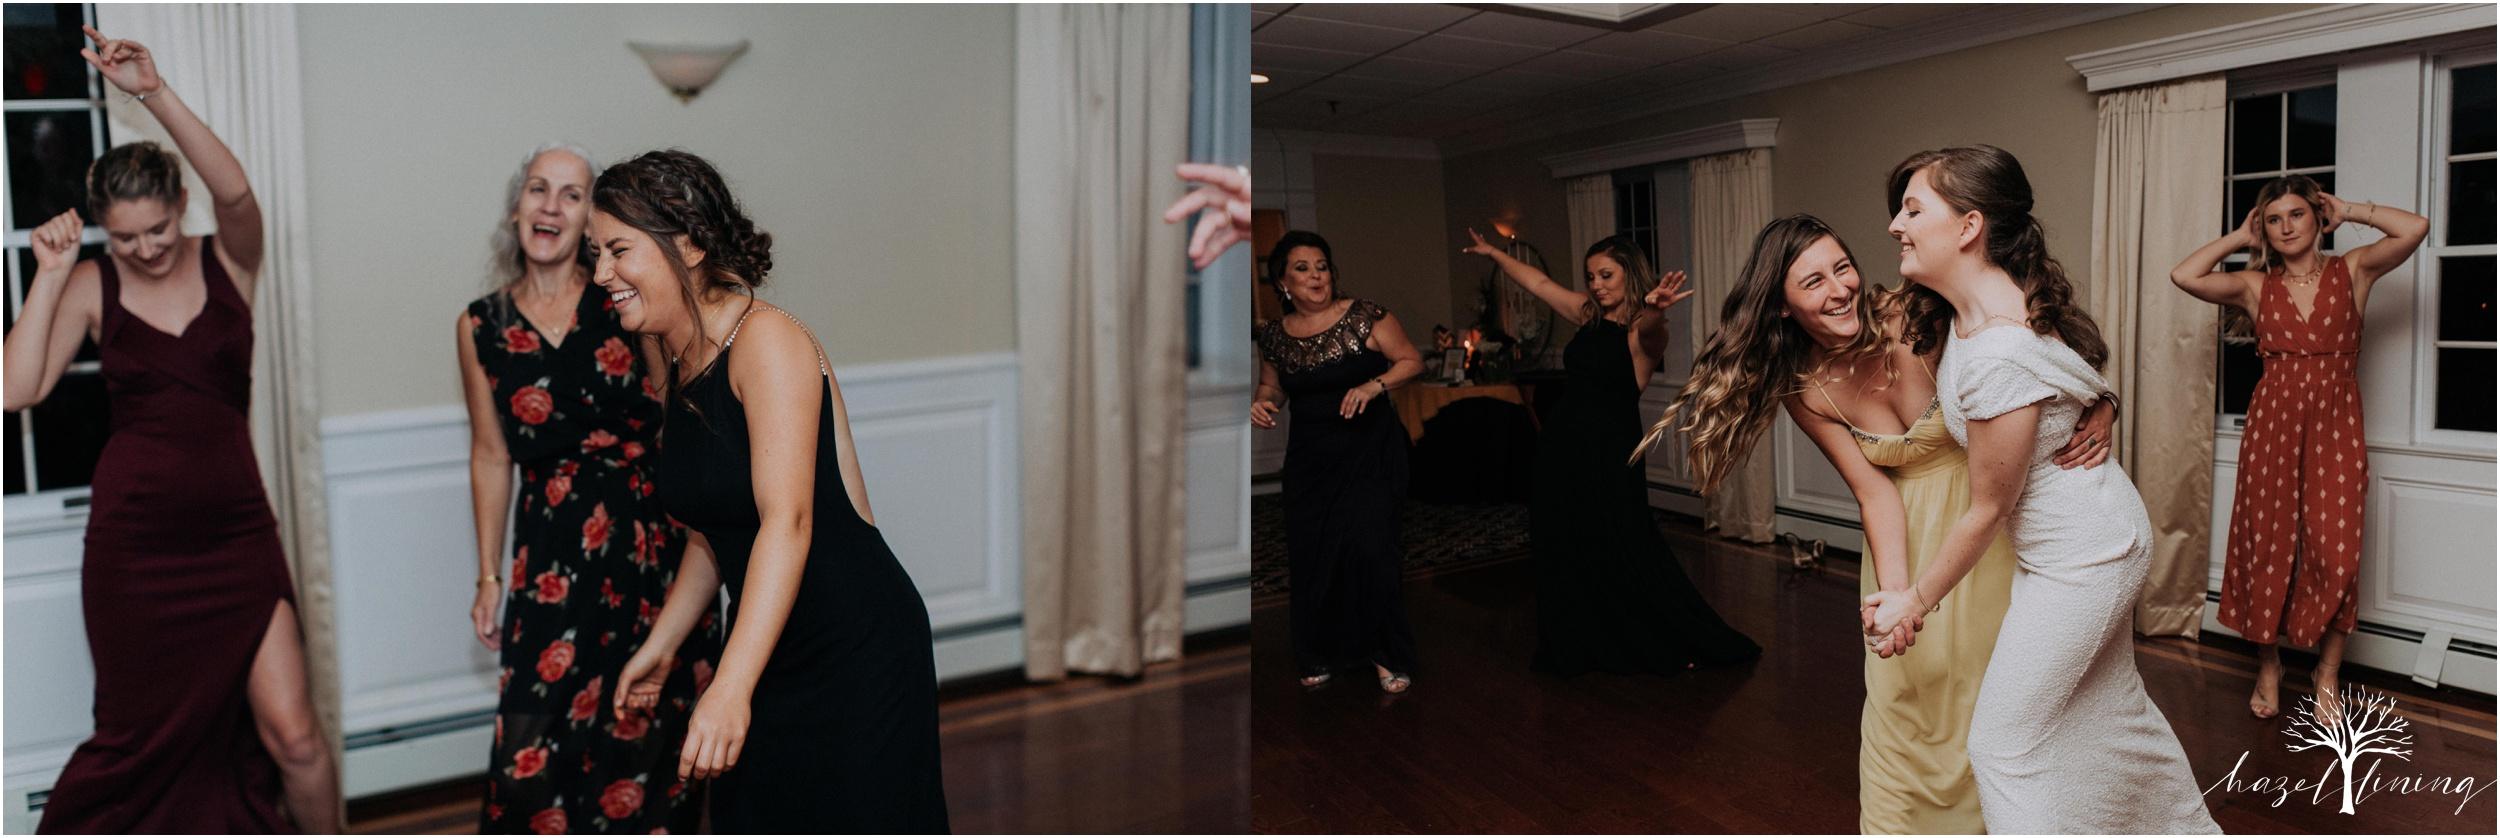 elizabeth-doelp-andrew-foreback-middletown-country-club-summer-langhorne-pennsylvania-wedding-hazel-lining-travel-wedding-elopement-photography_0148.jpg